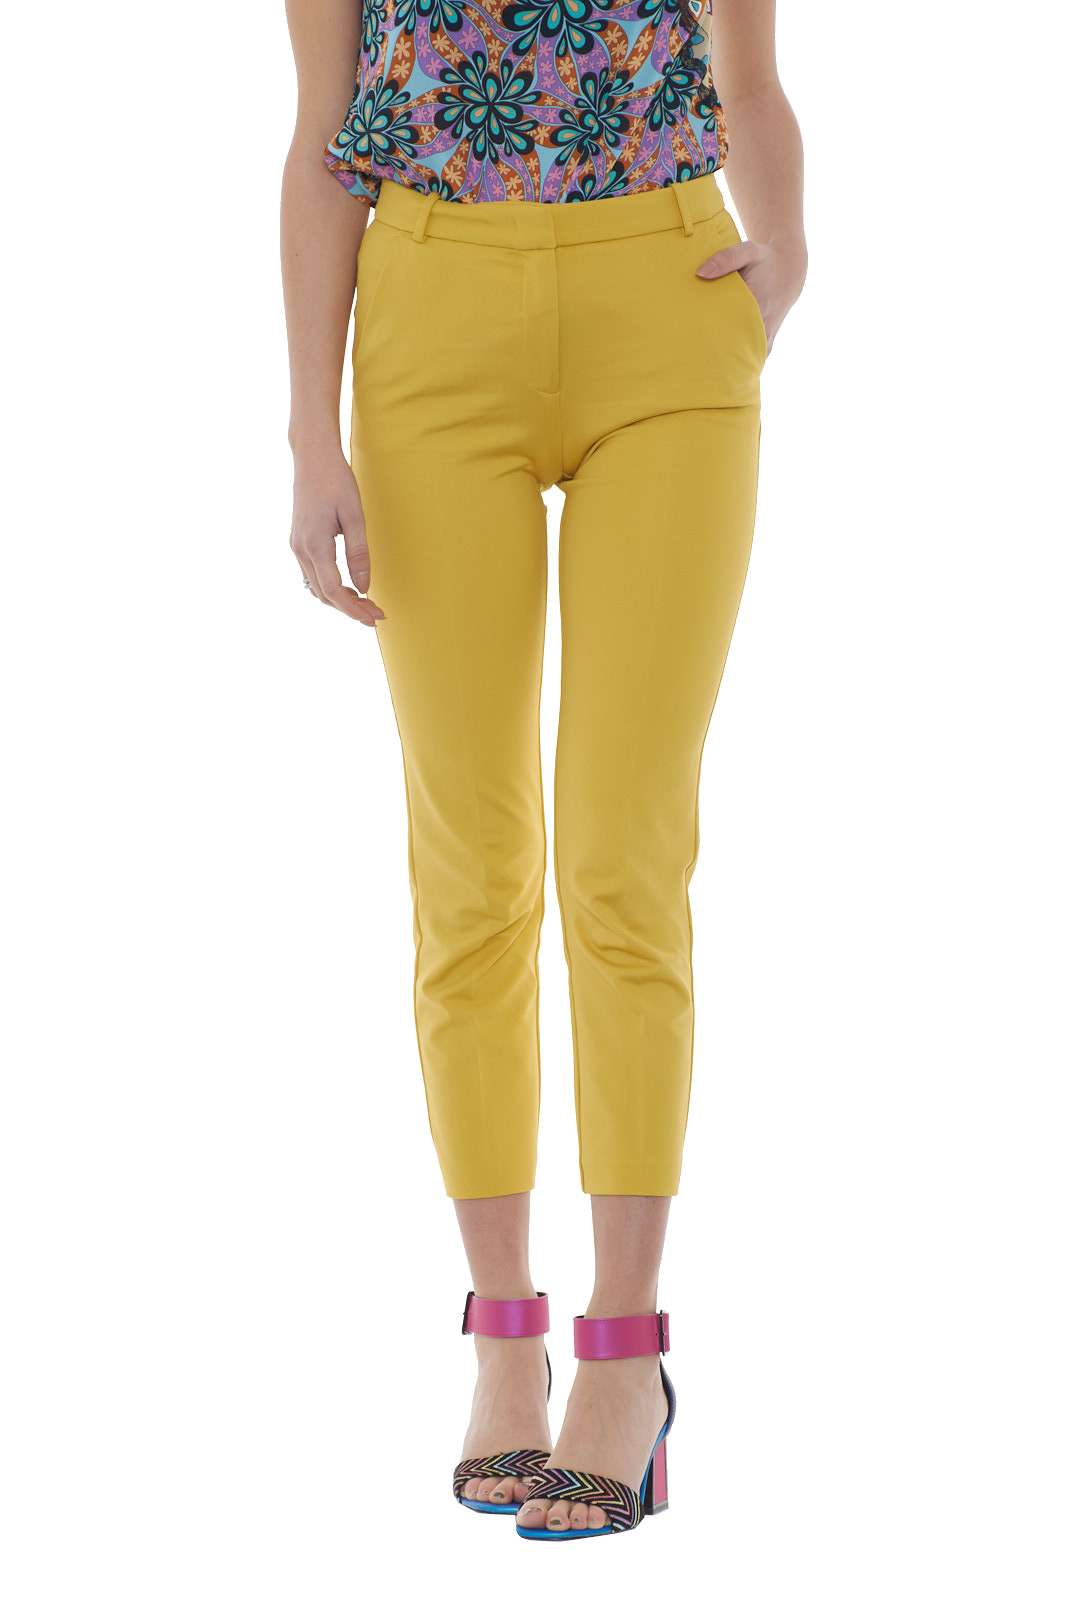 https://www.parmax.com/media/catalog/product/a/i/PE-outlet_parmax-pantaloni-donna-Pinko-1g14ts-A.jpg